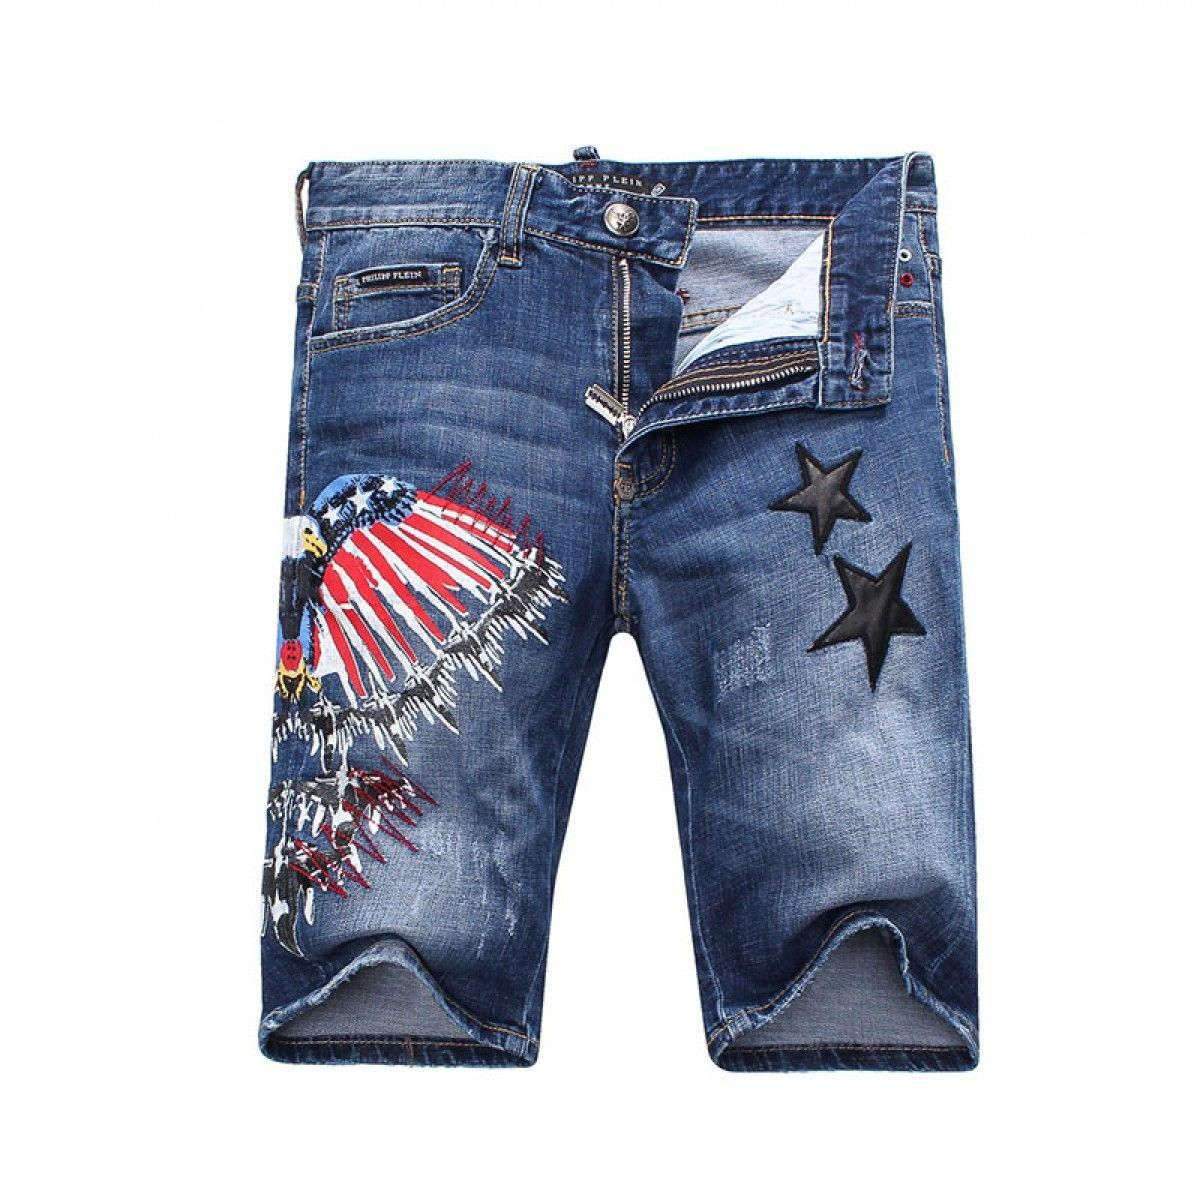 738461439f Dsquared2 SS2018 Mens Short Jeans Tiger Badge Navy Blue | Clothingtmall |  Jeans, Jean Shorts, Denim jeans